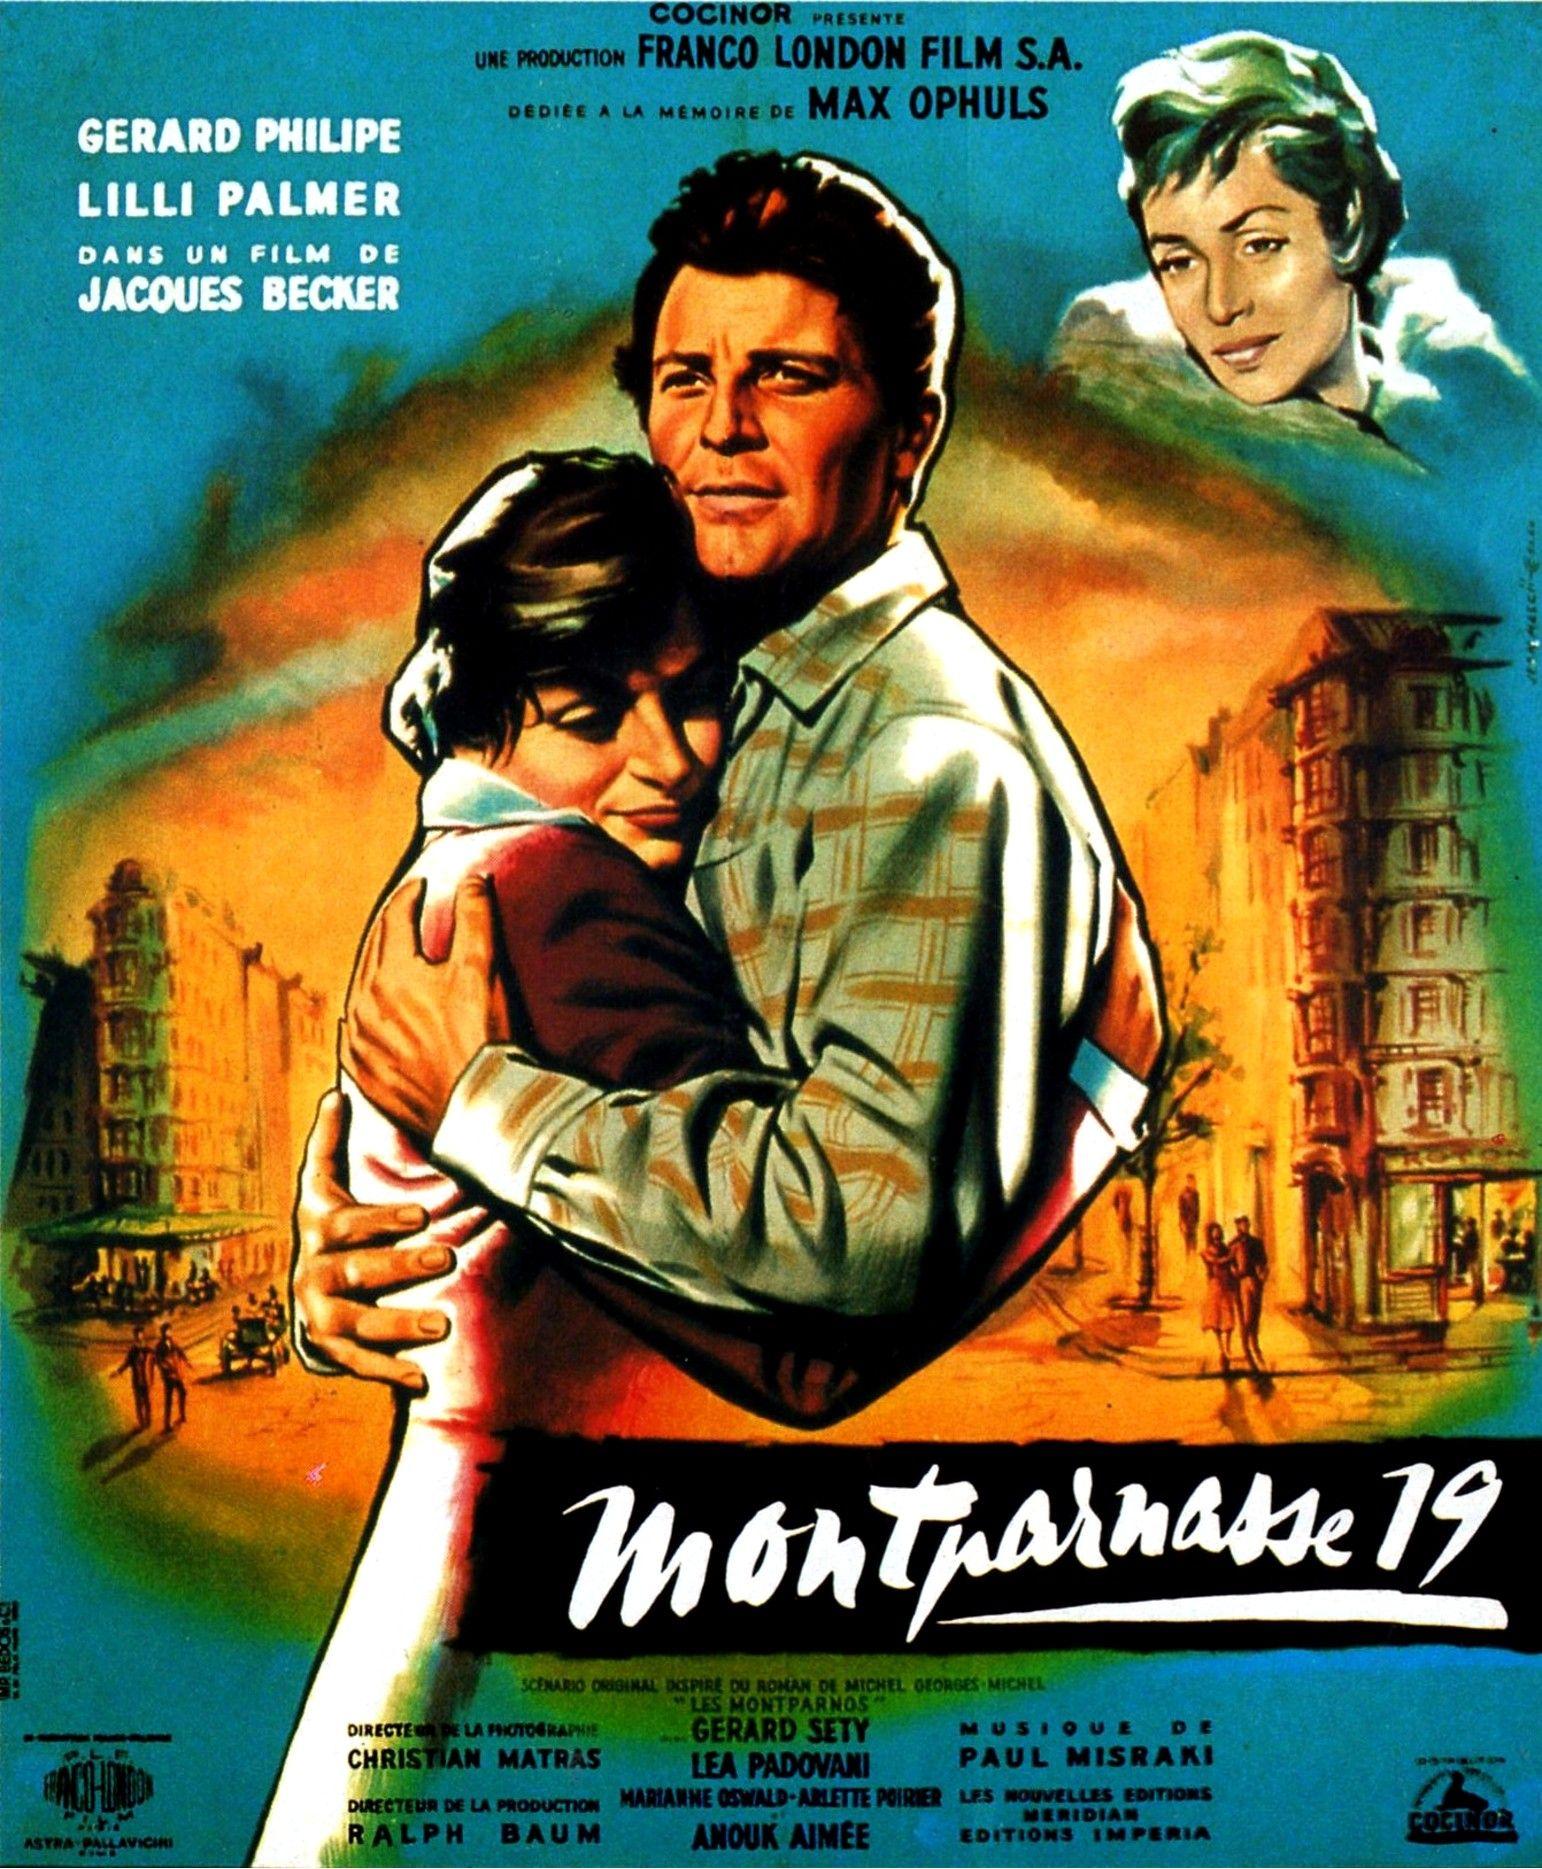 'Montparnasse 19' - Jacques Becker (1957) Jacques Becker, Film Director,